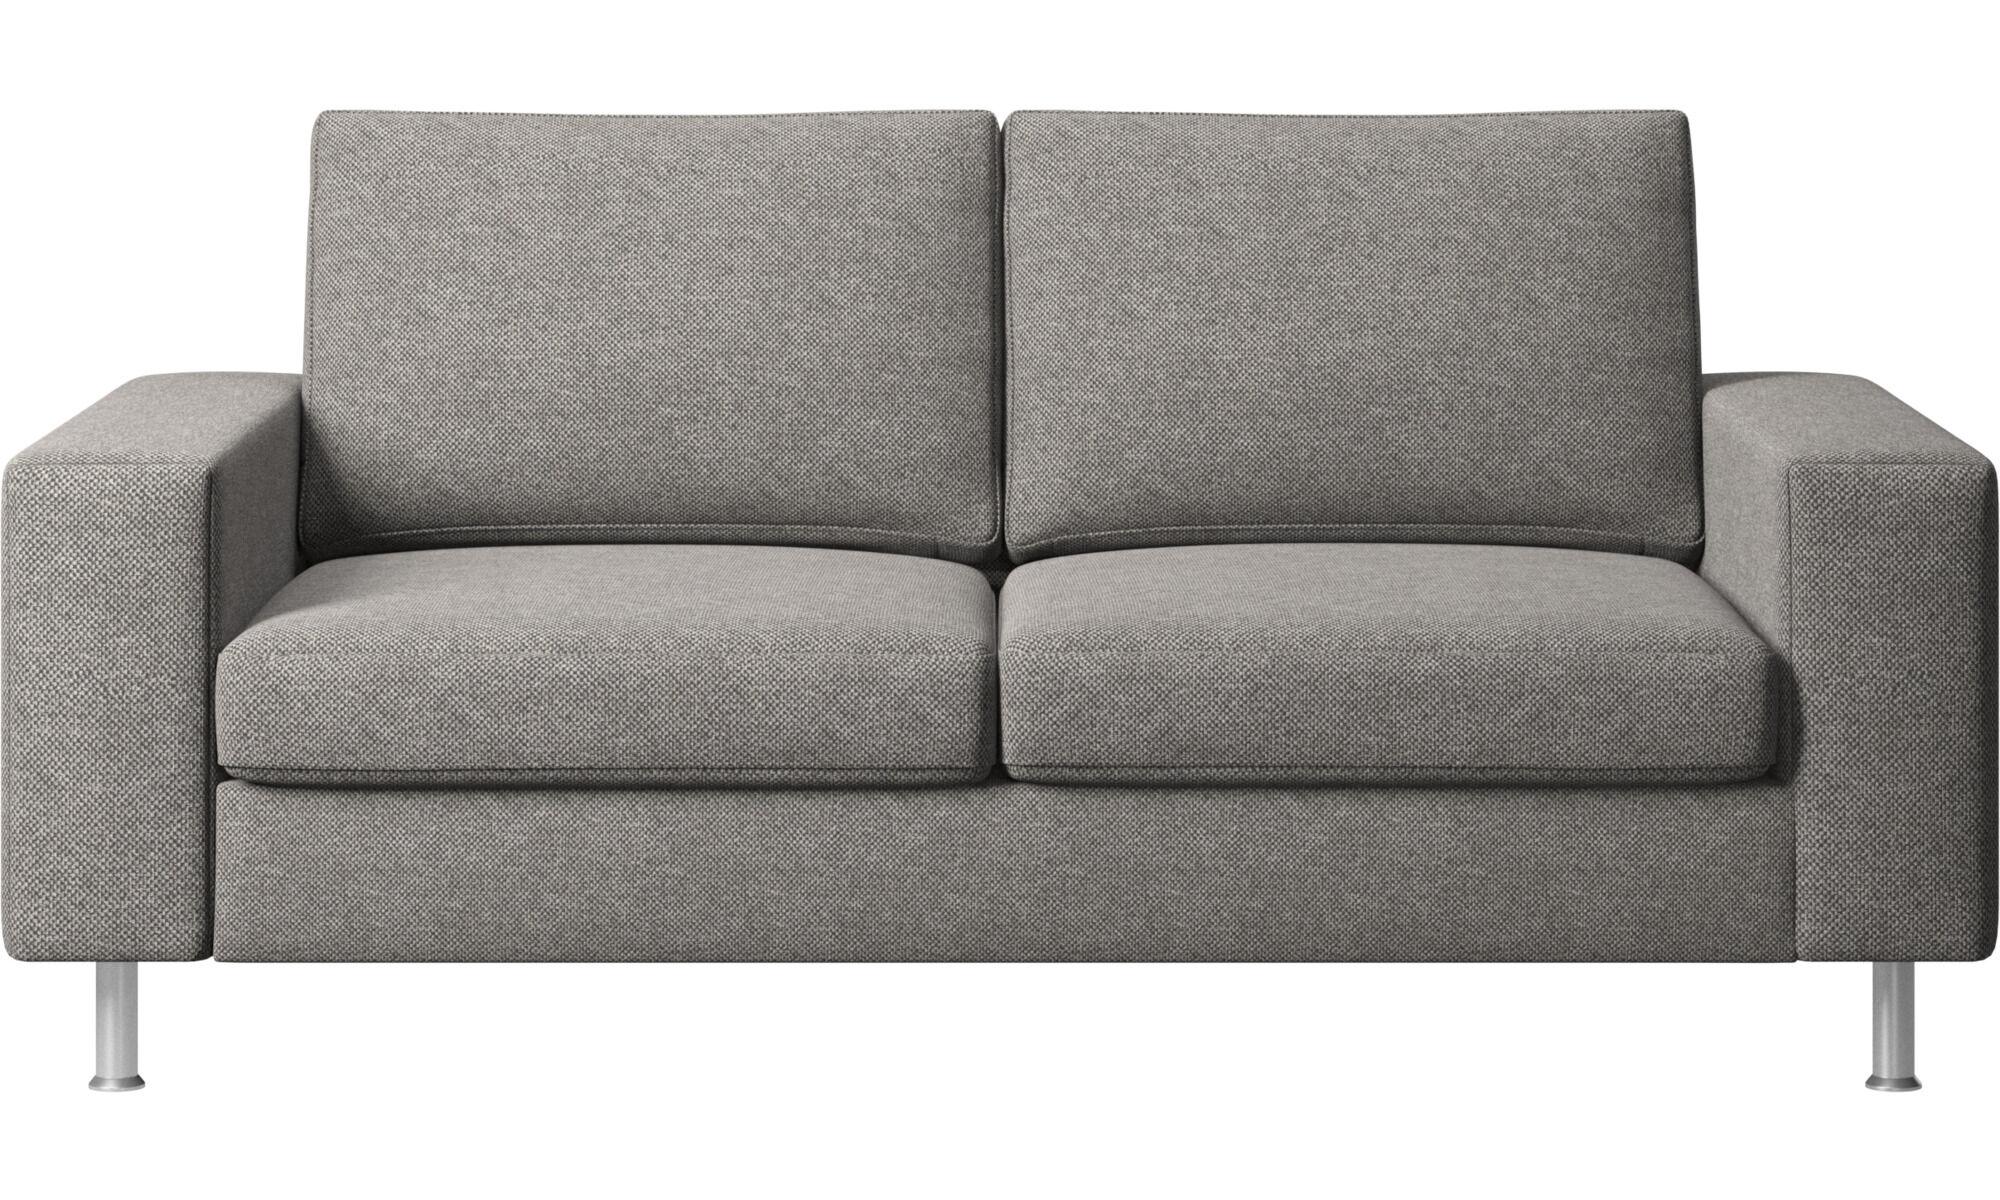 2 Sitzer Sofas   Indivi 2 Sofa   Grau   Stoff ...